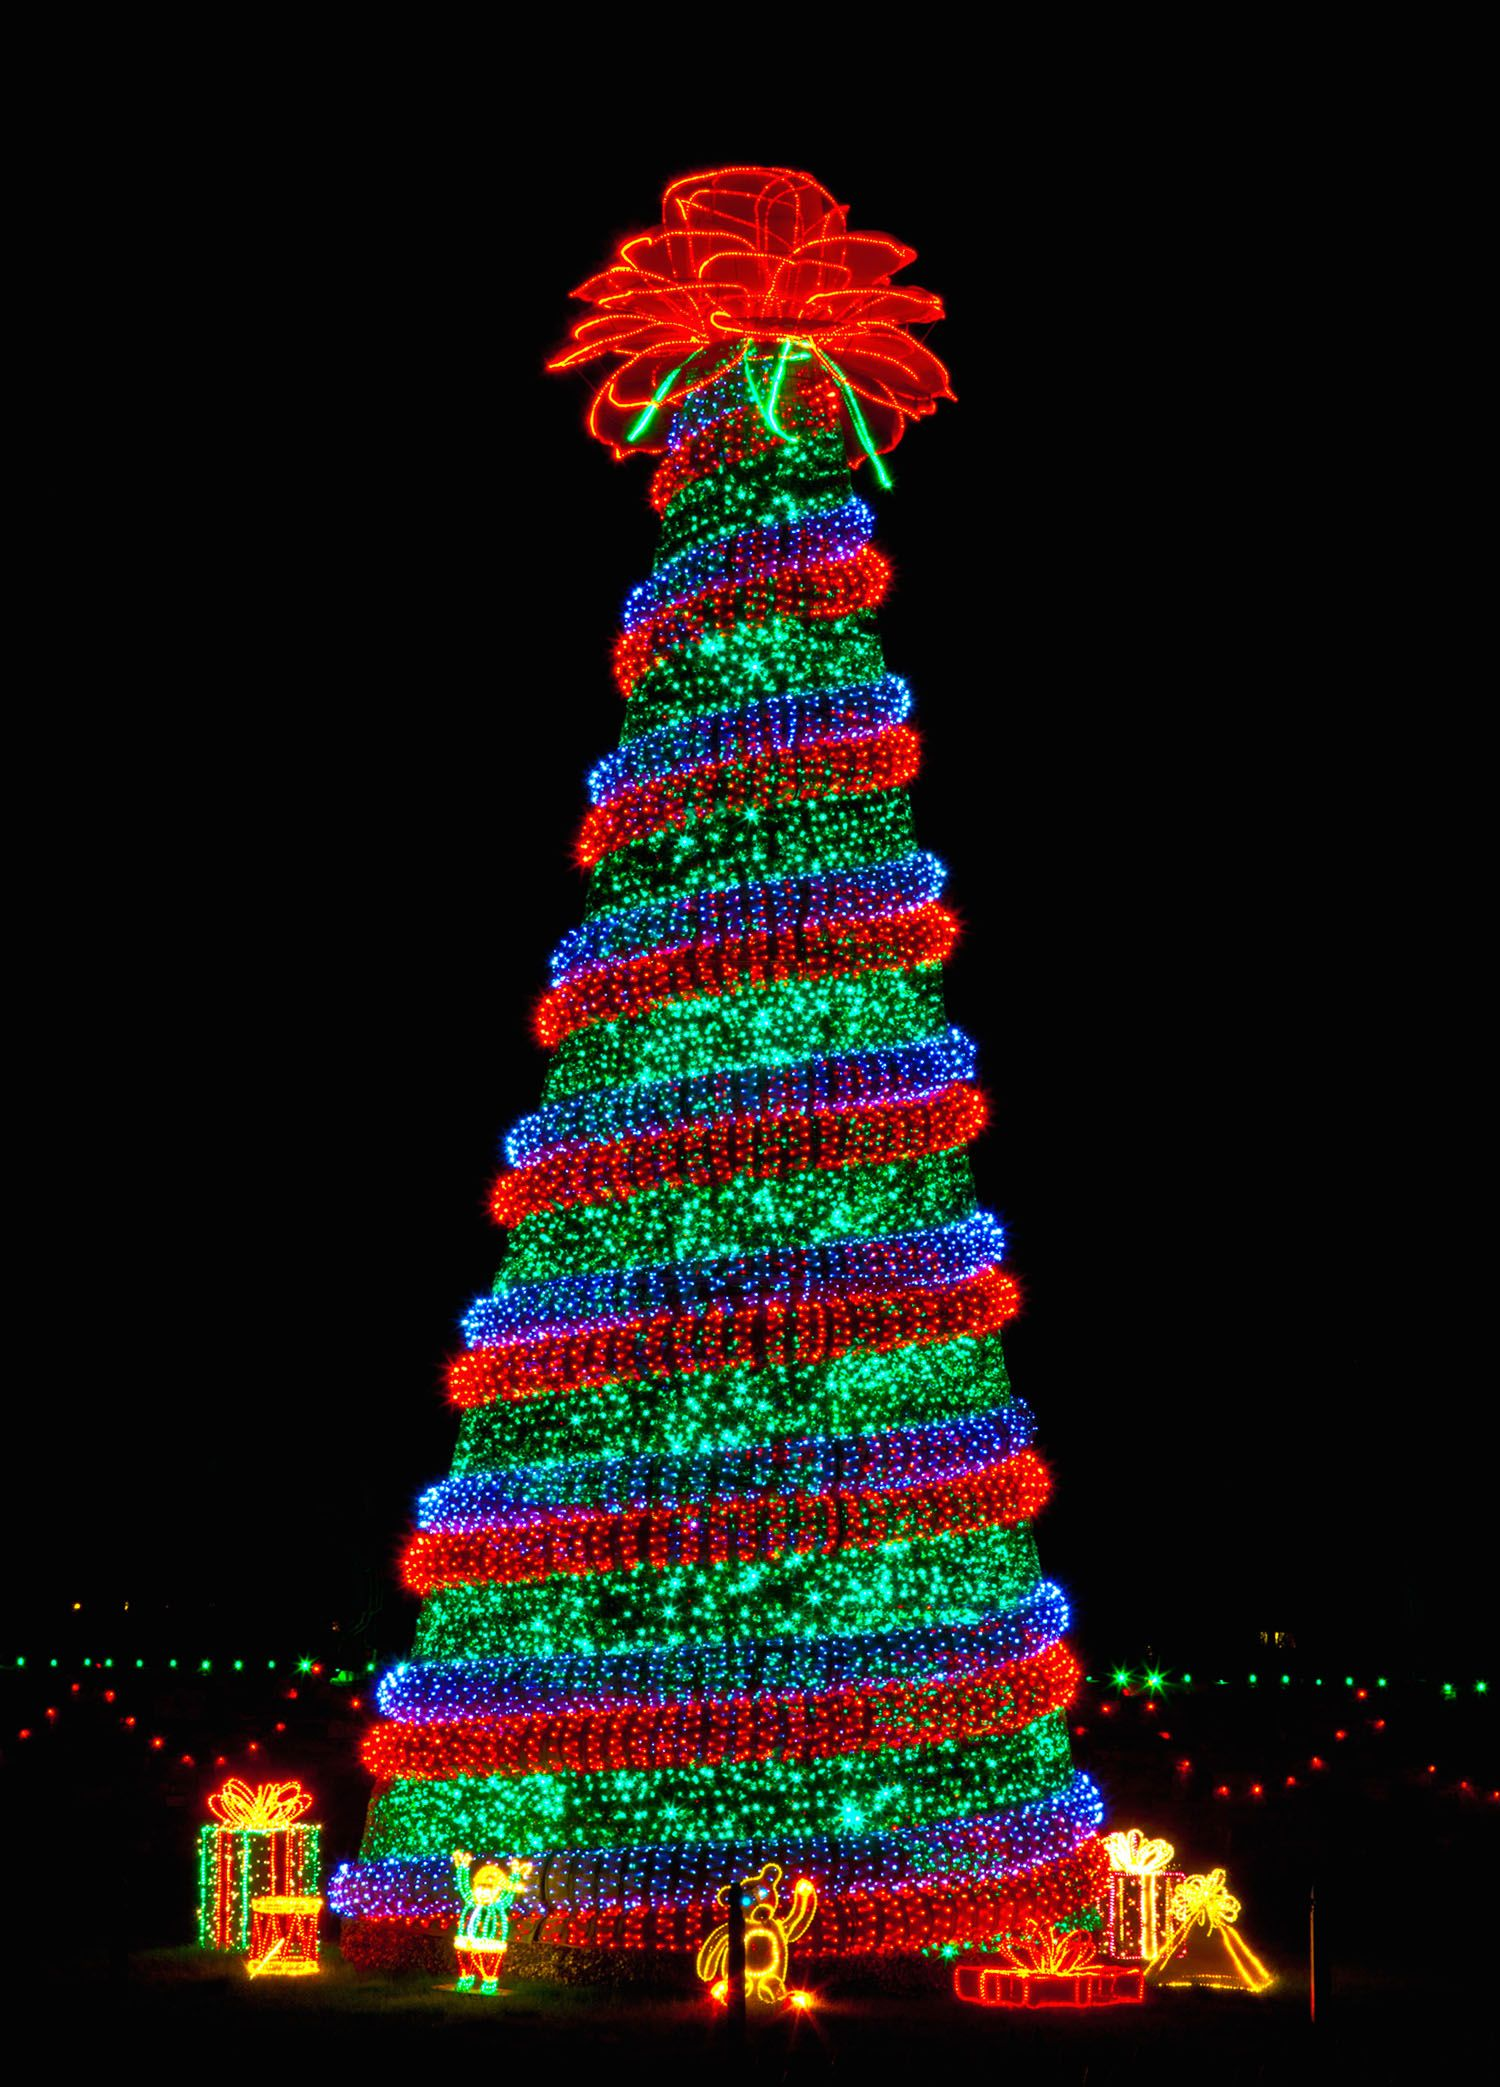 181ea18c2c1055a83a1f5fbcb2ba8491 - Garvan Gardens Hot Springs Christmas Lights